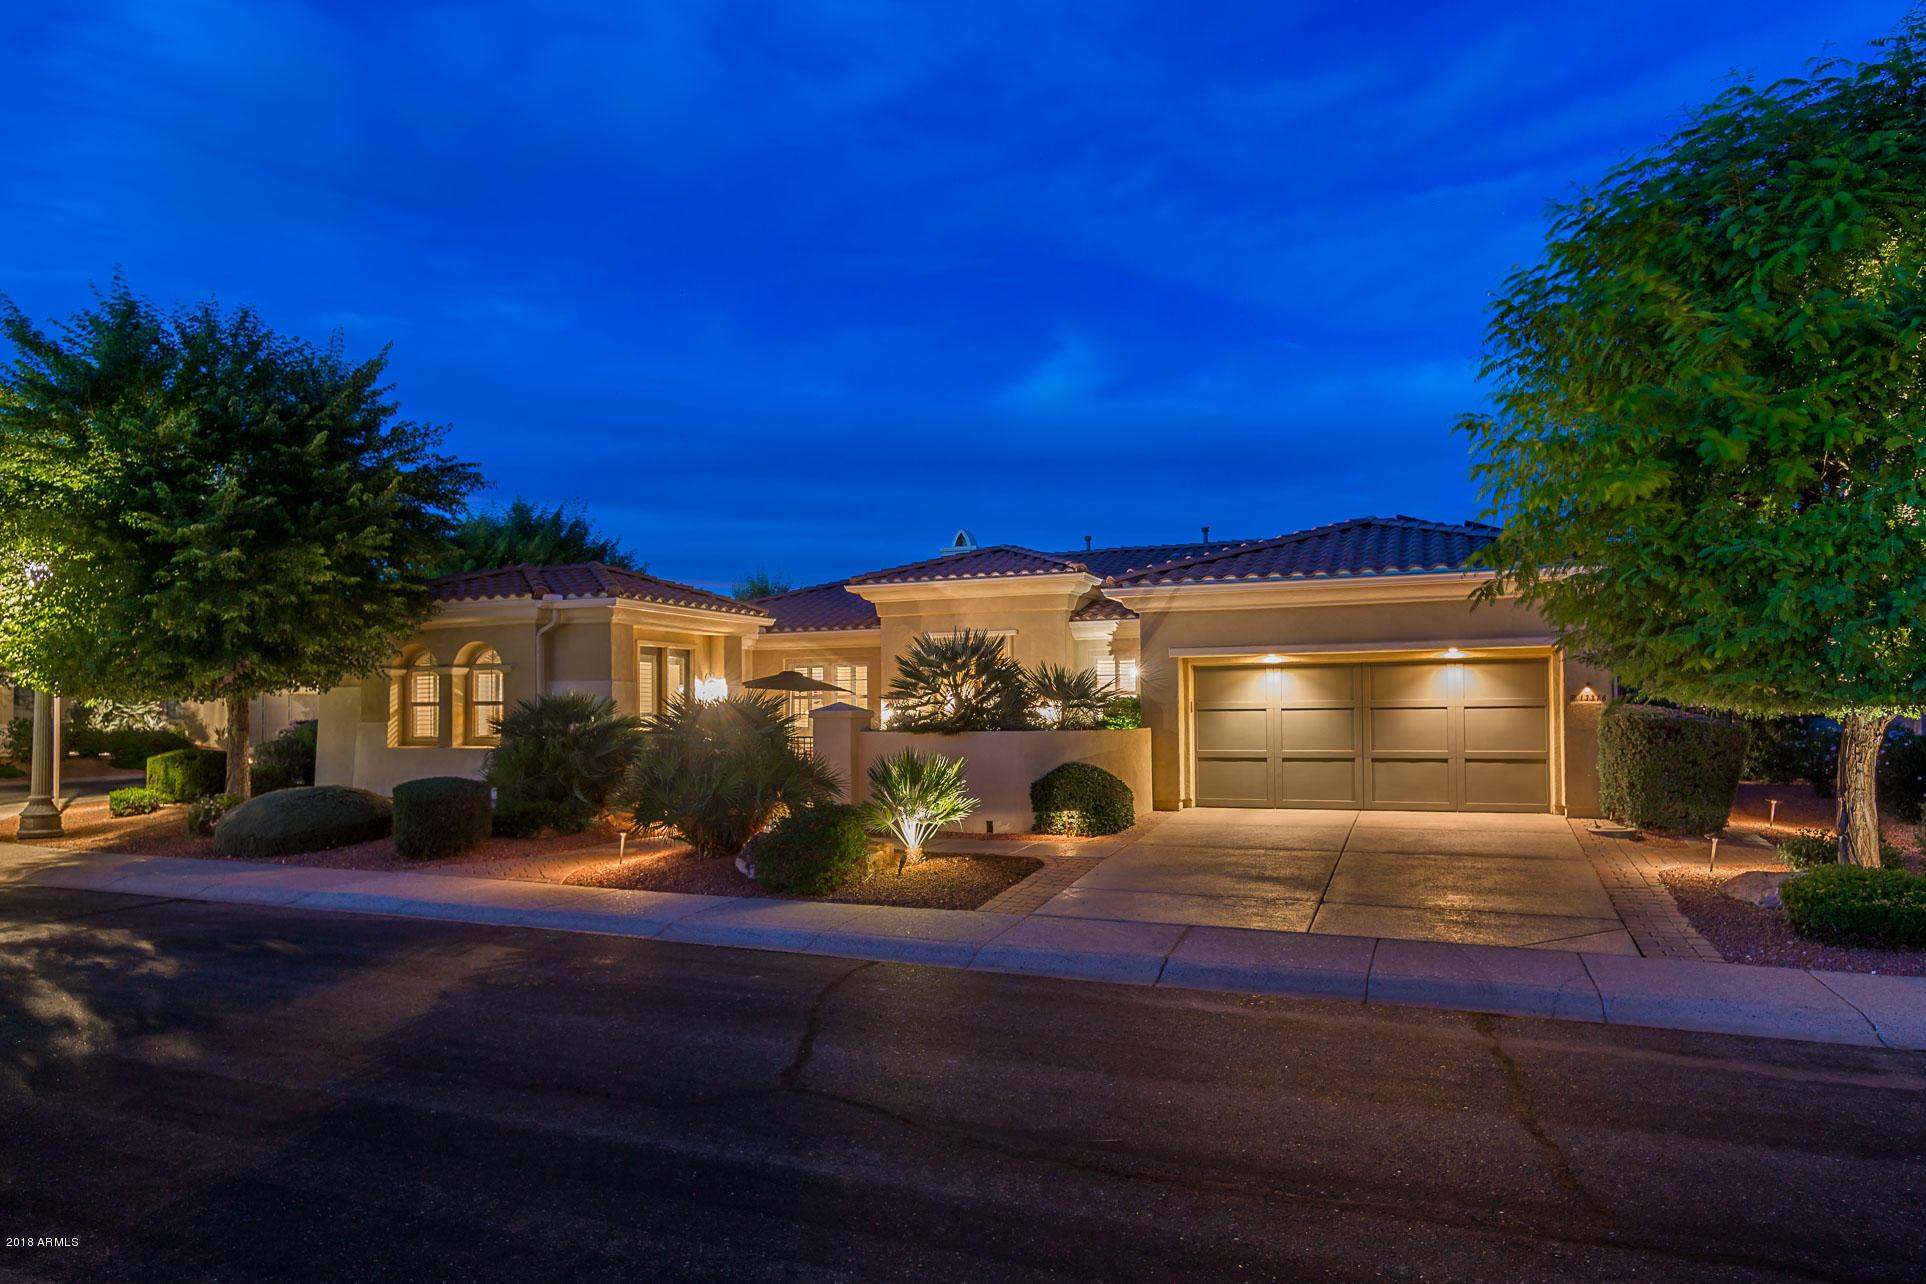 MLS 5839276 13316 W RINCON Drive, Sun City West, AZ 85375 Sun City West AZ Luxury